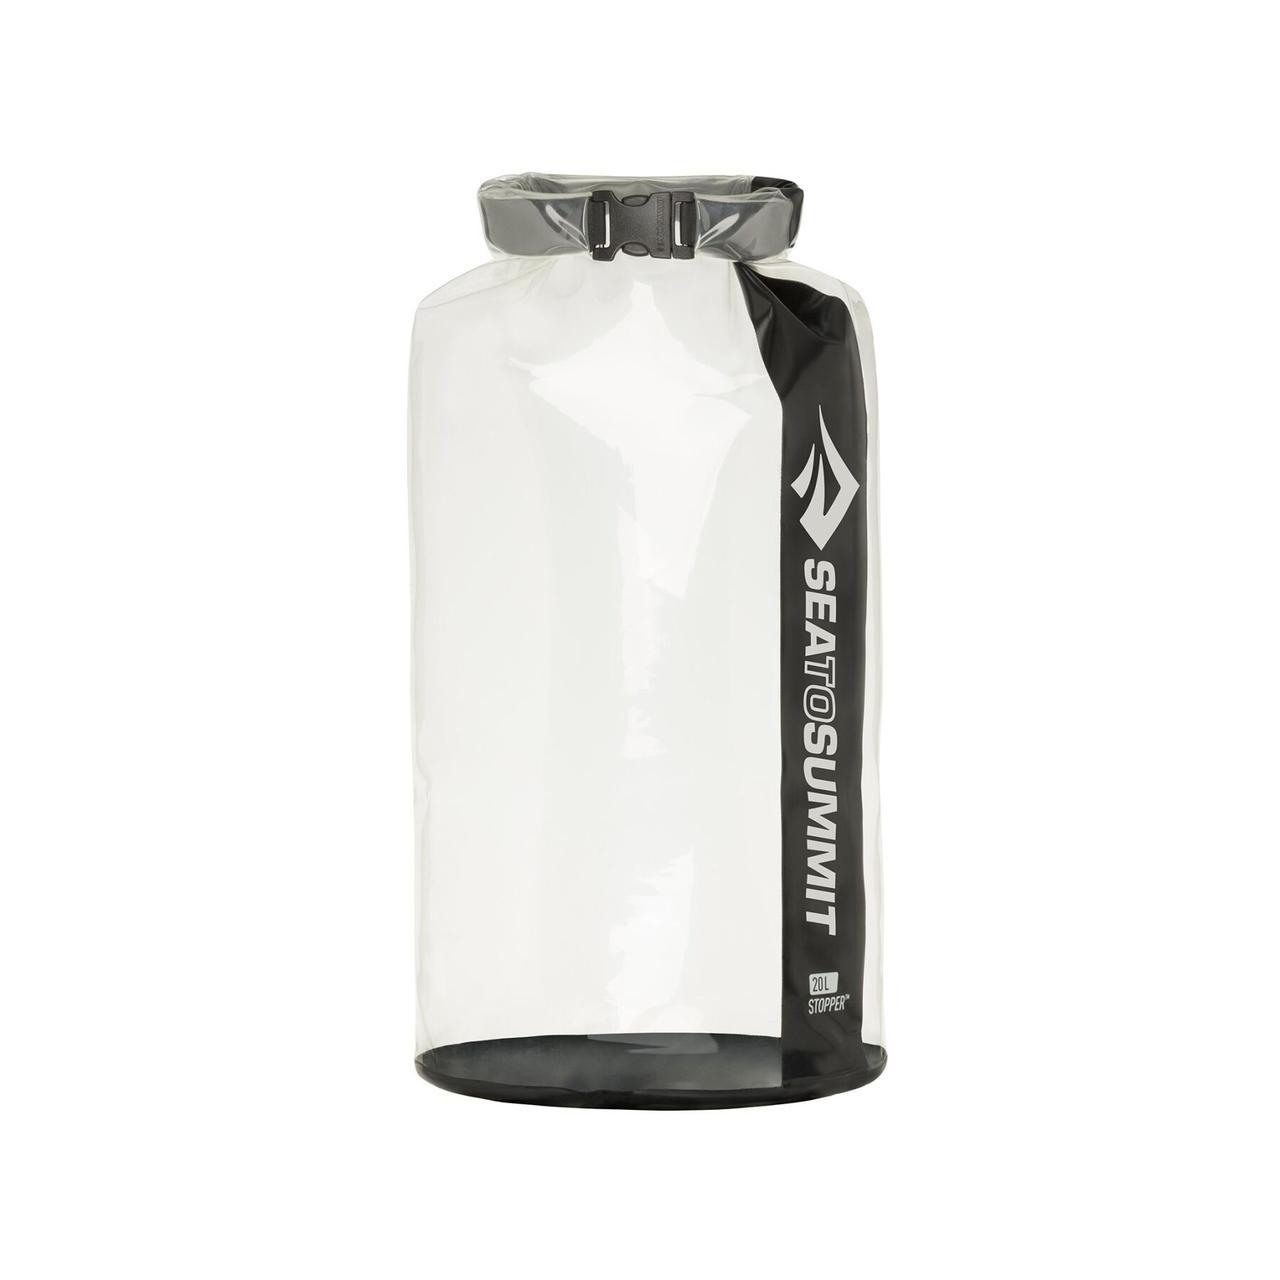 Гермомішок Sea To Summit Stopper Dry Bag 20 Clear Black SKL35-253998